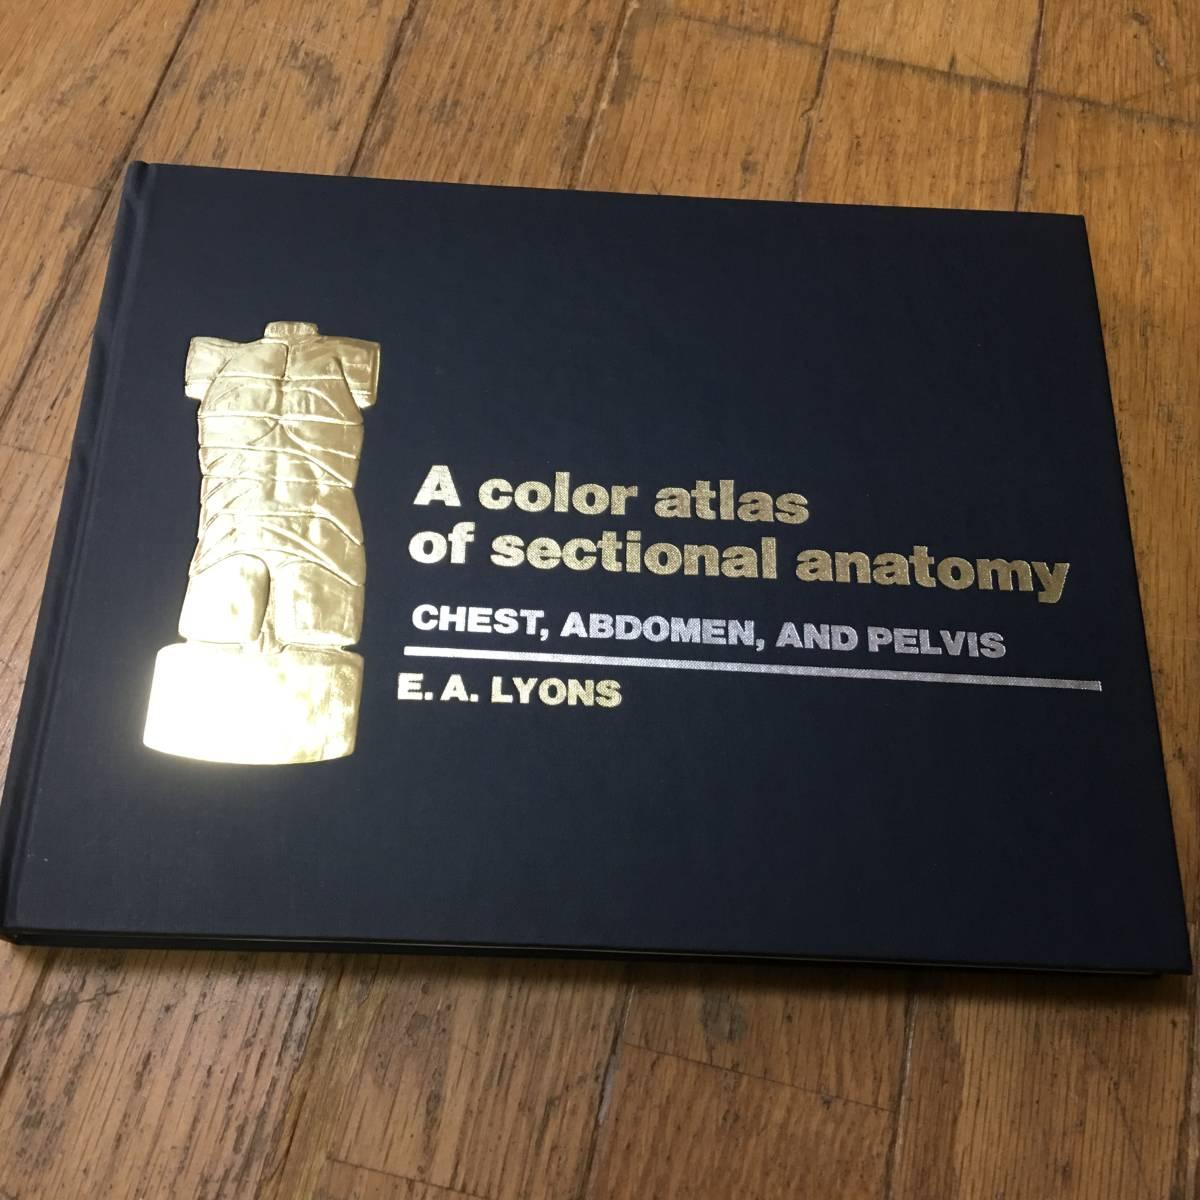 即決 A color atlas of sectional anatomy 医学洋書・大型本